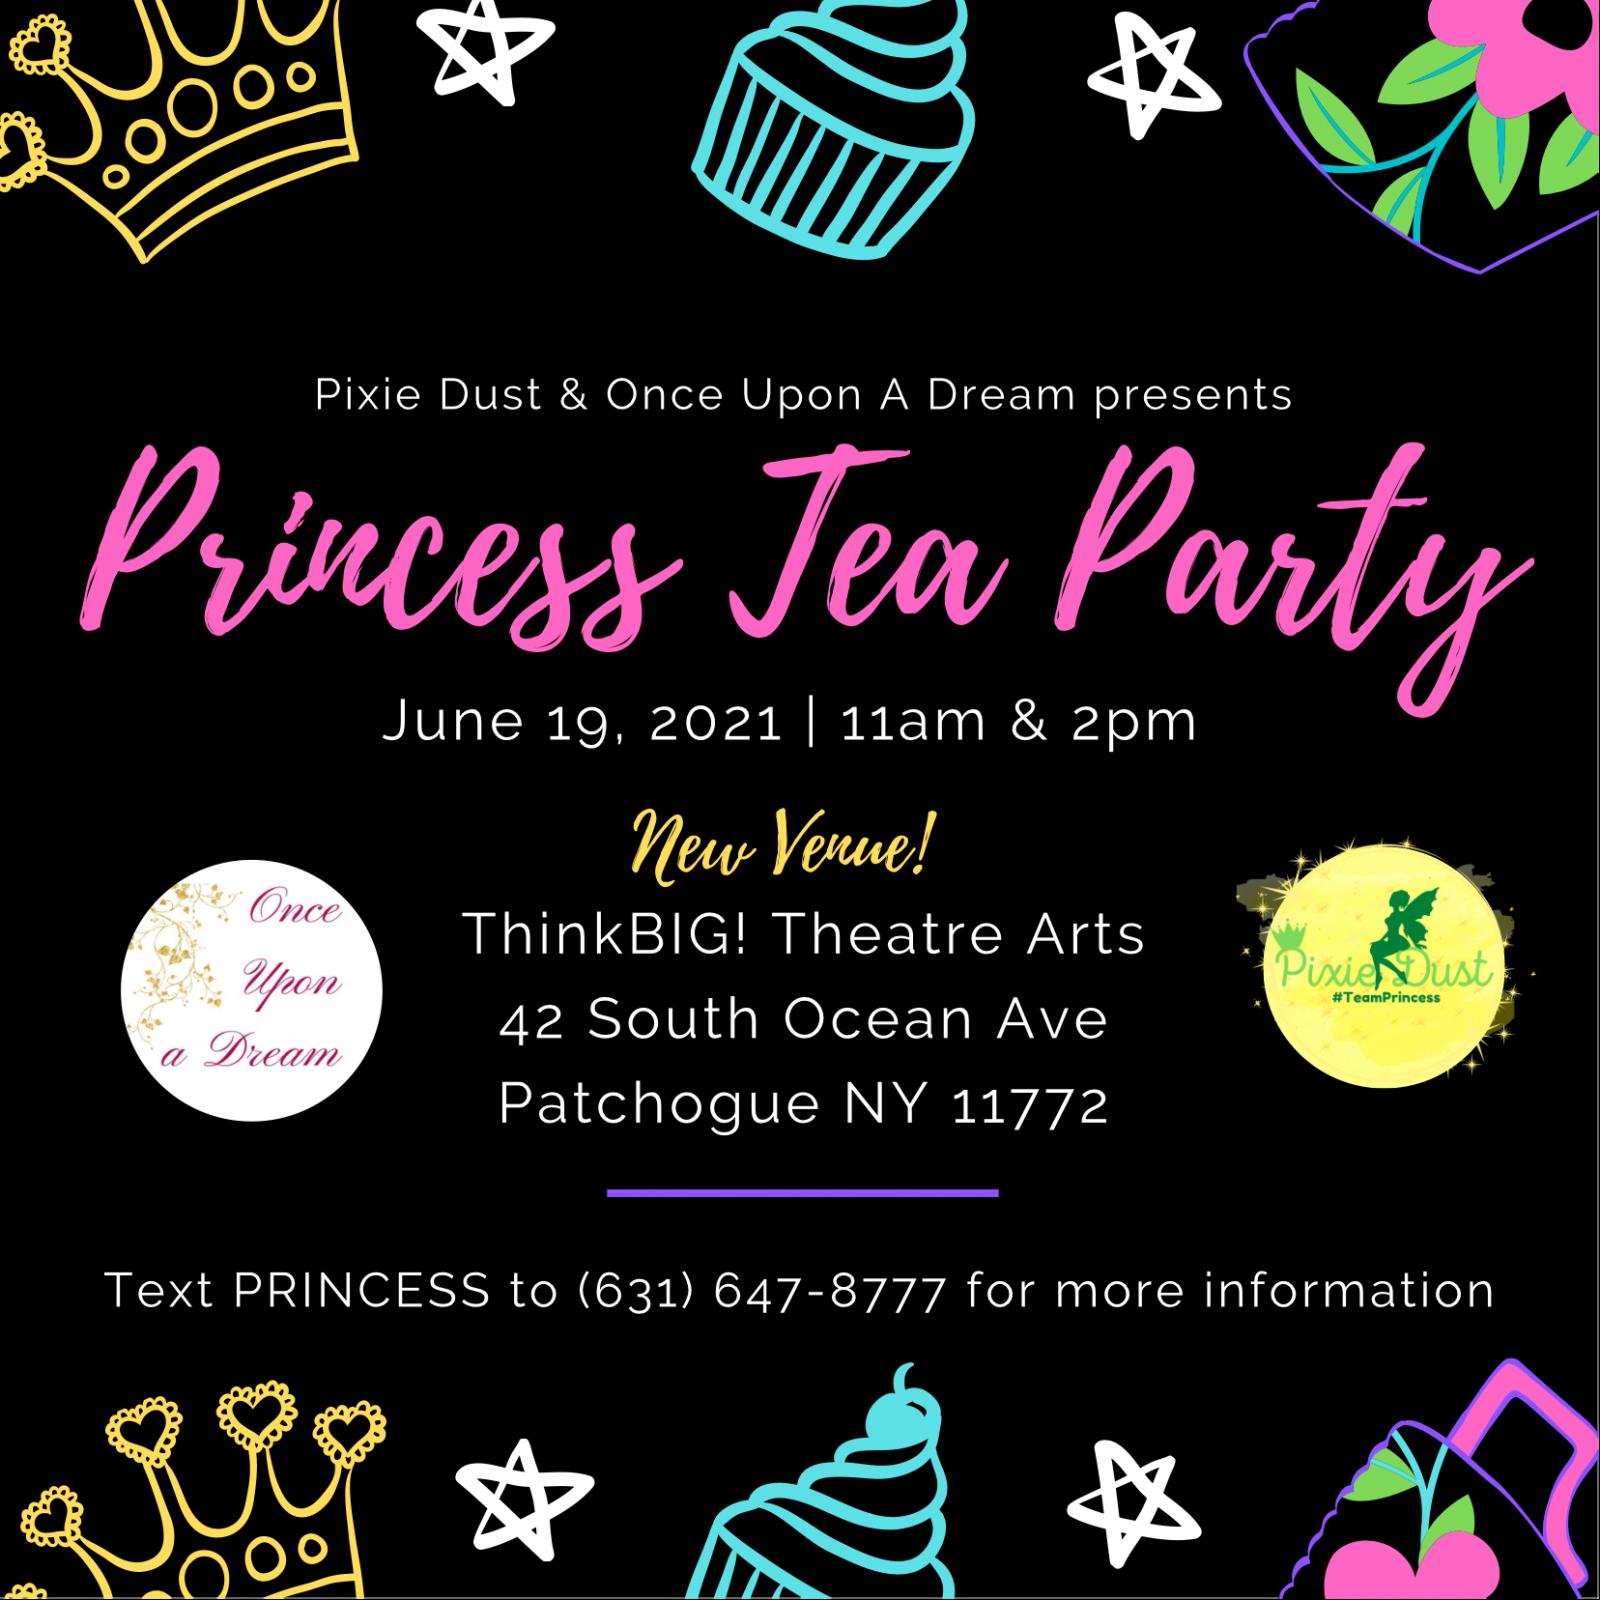 Princess Tea Party additional adult